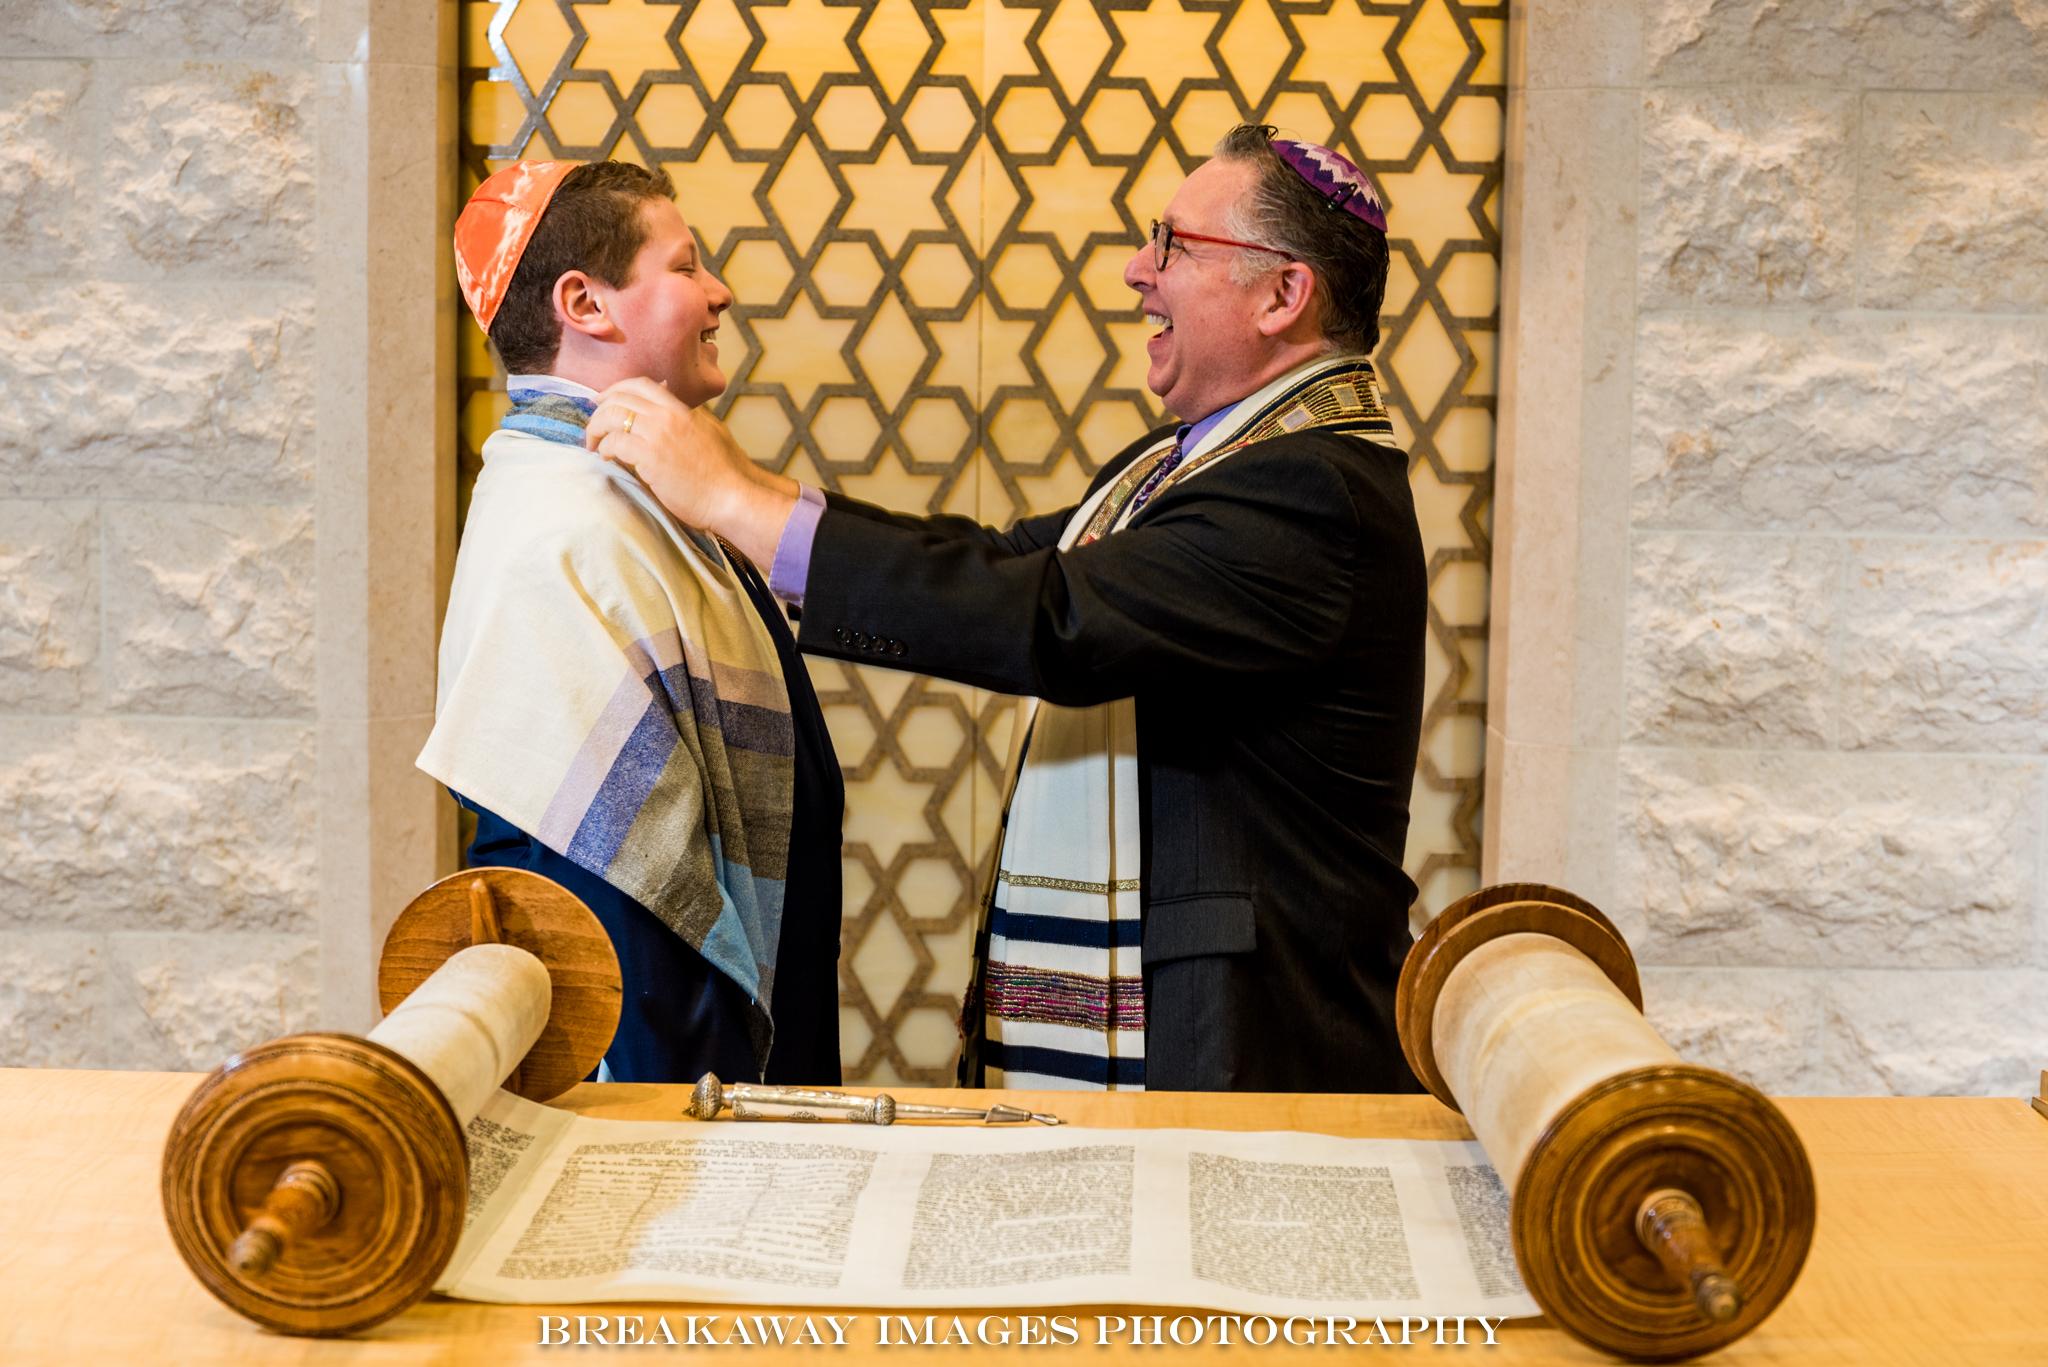 Matthew Levithan Bar Mitzvah 2019-01-19 v-101.jpg